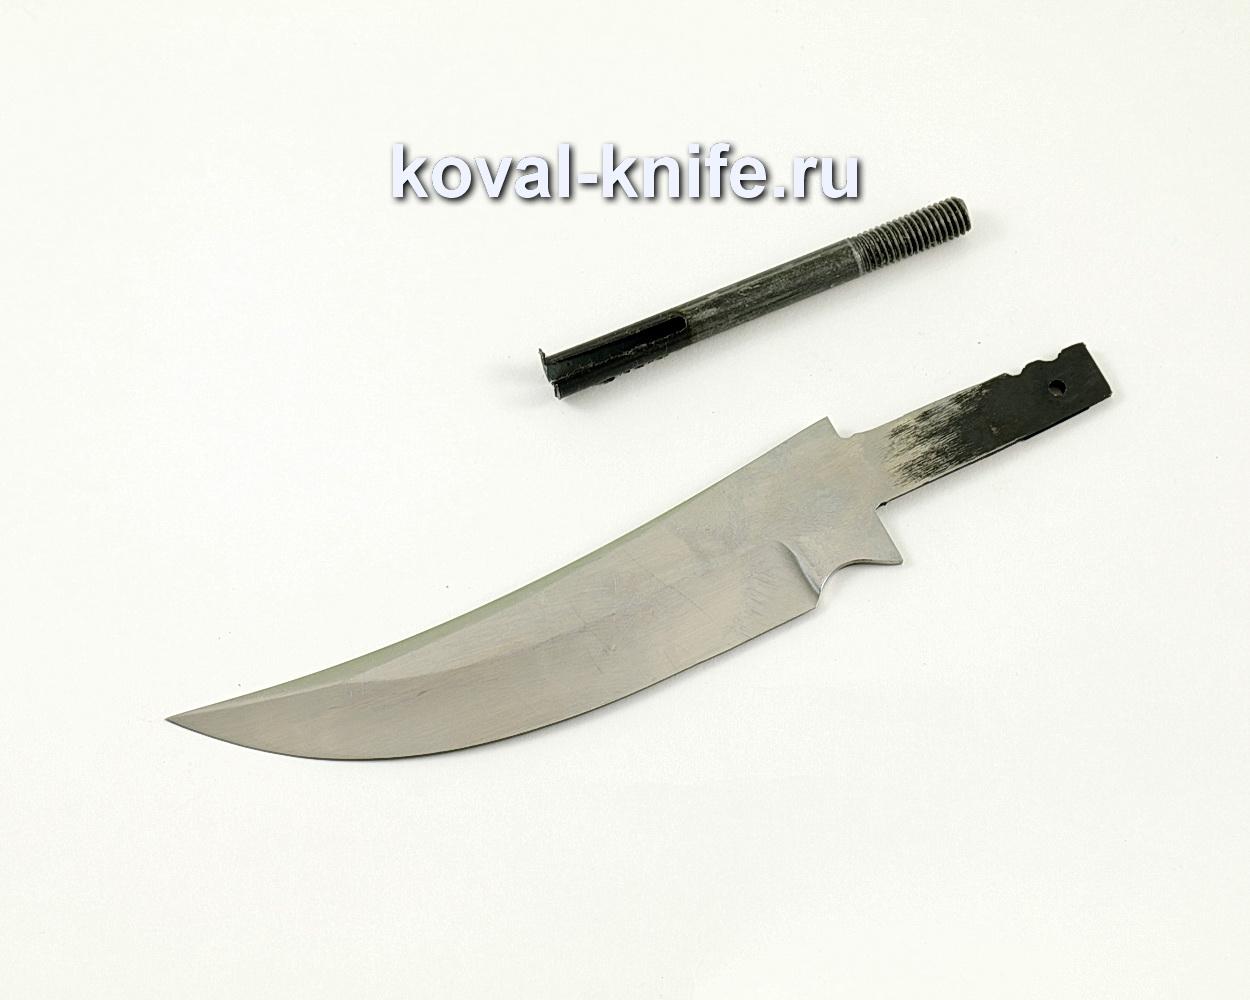 Клинок для ножа Ворон (кованая сталь 95Х18)